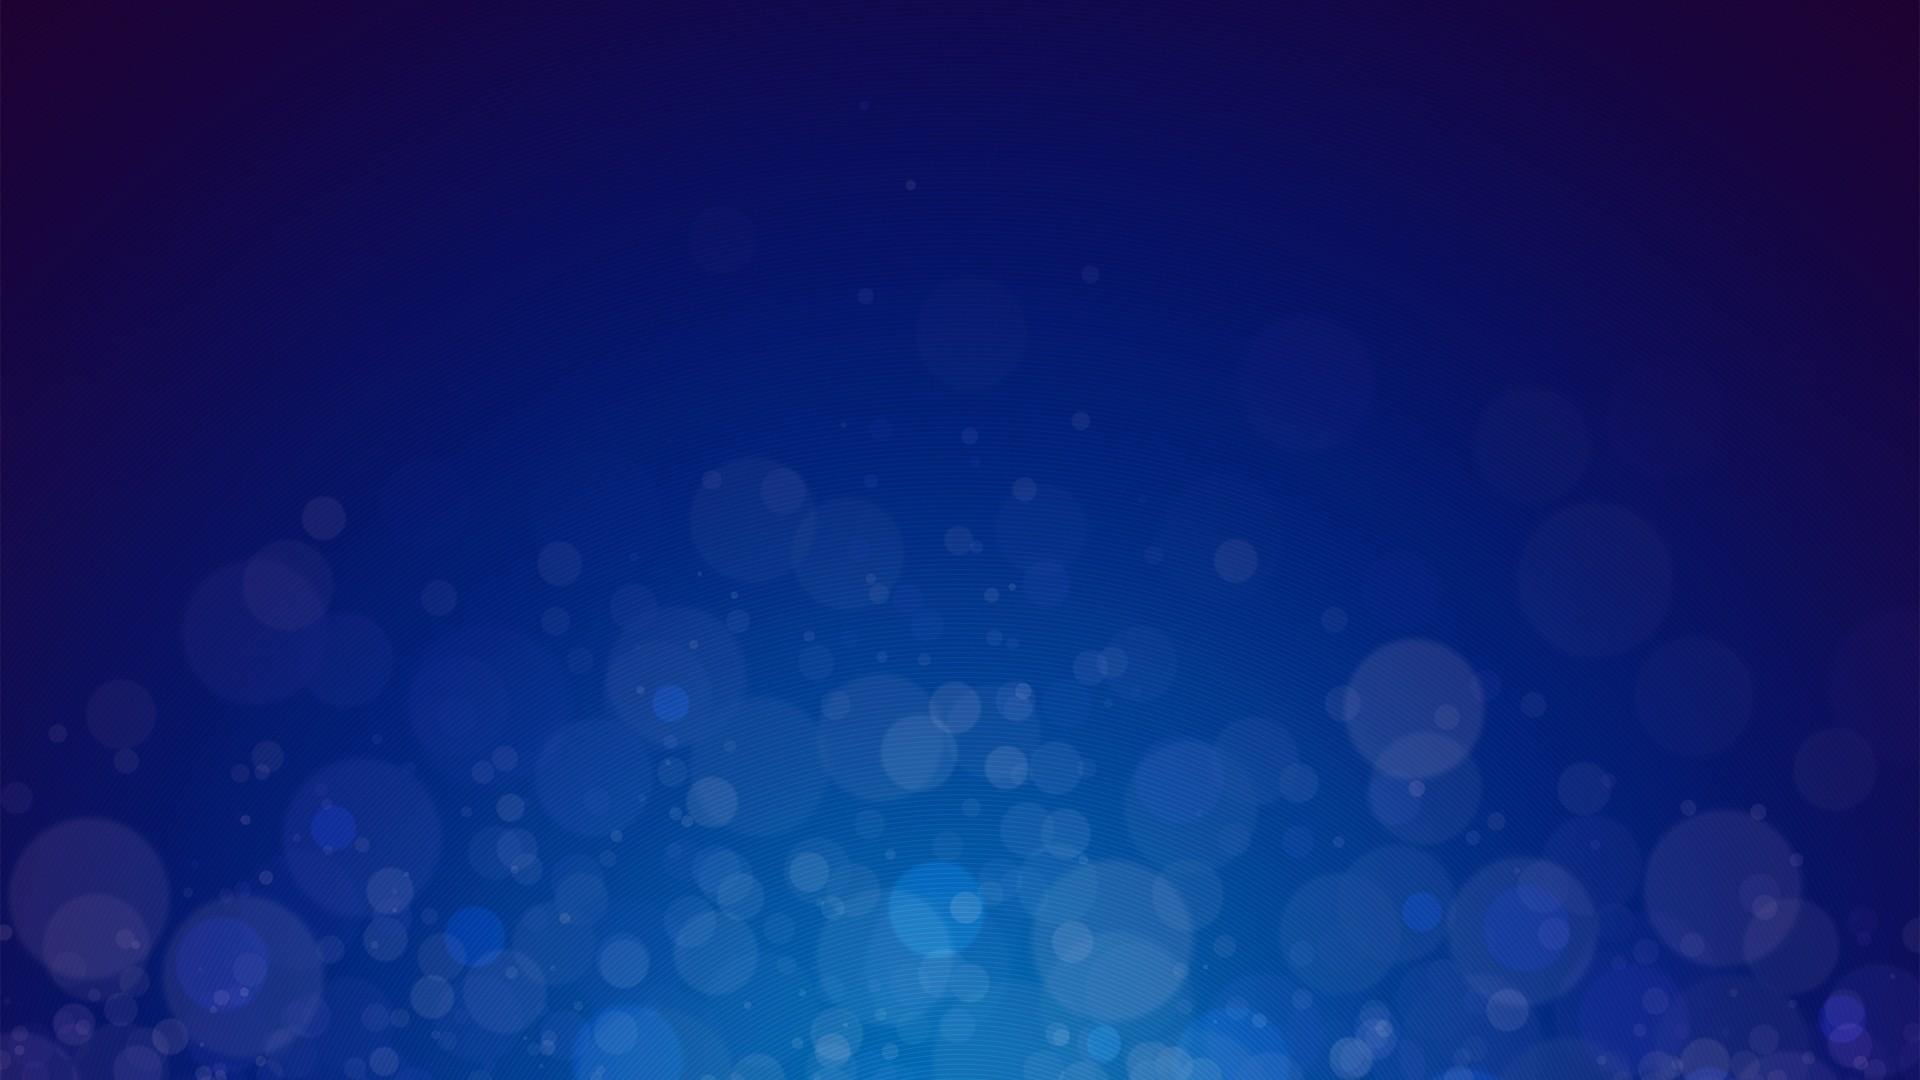 Spark Blue hd desktop wallpaper